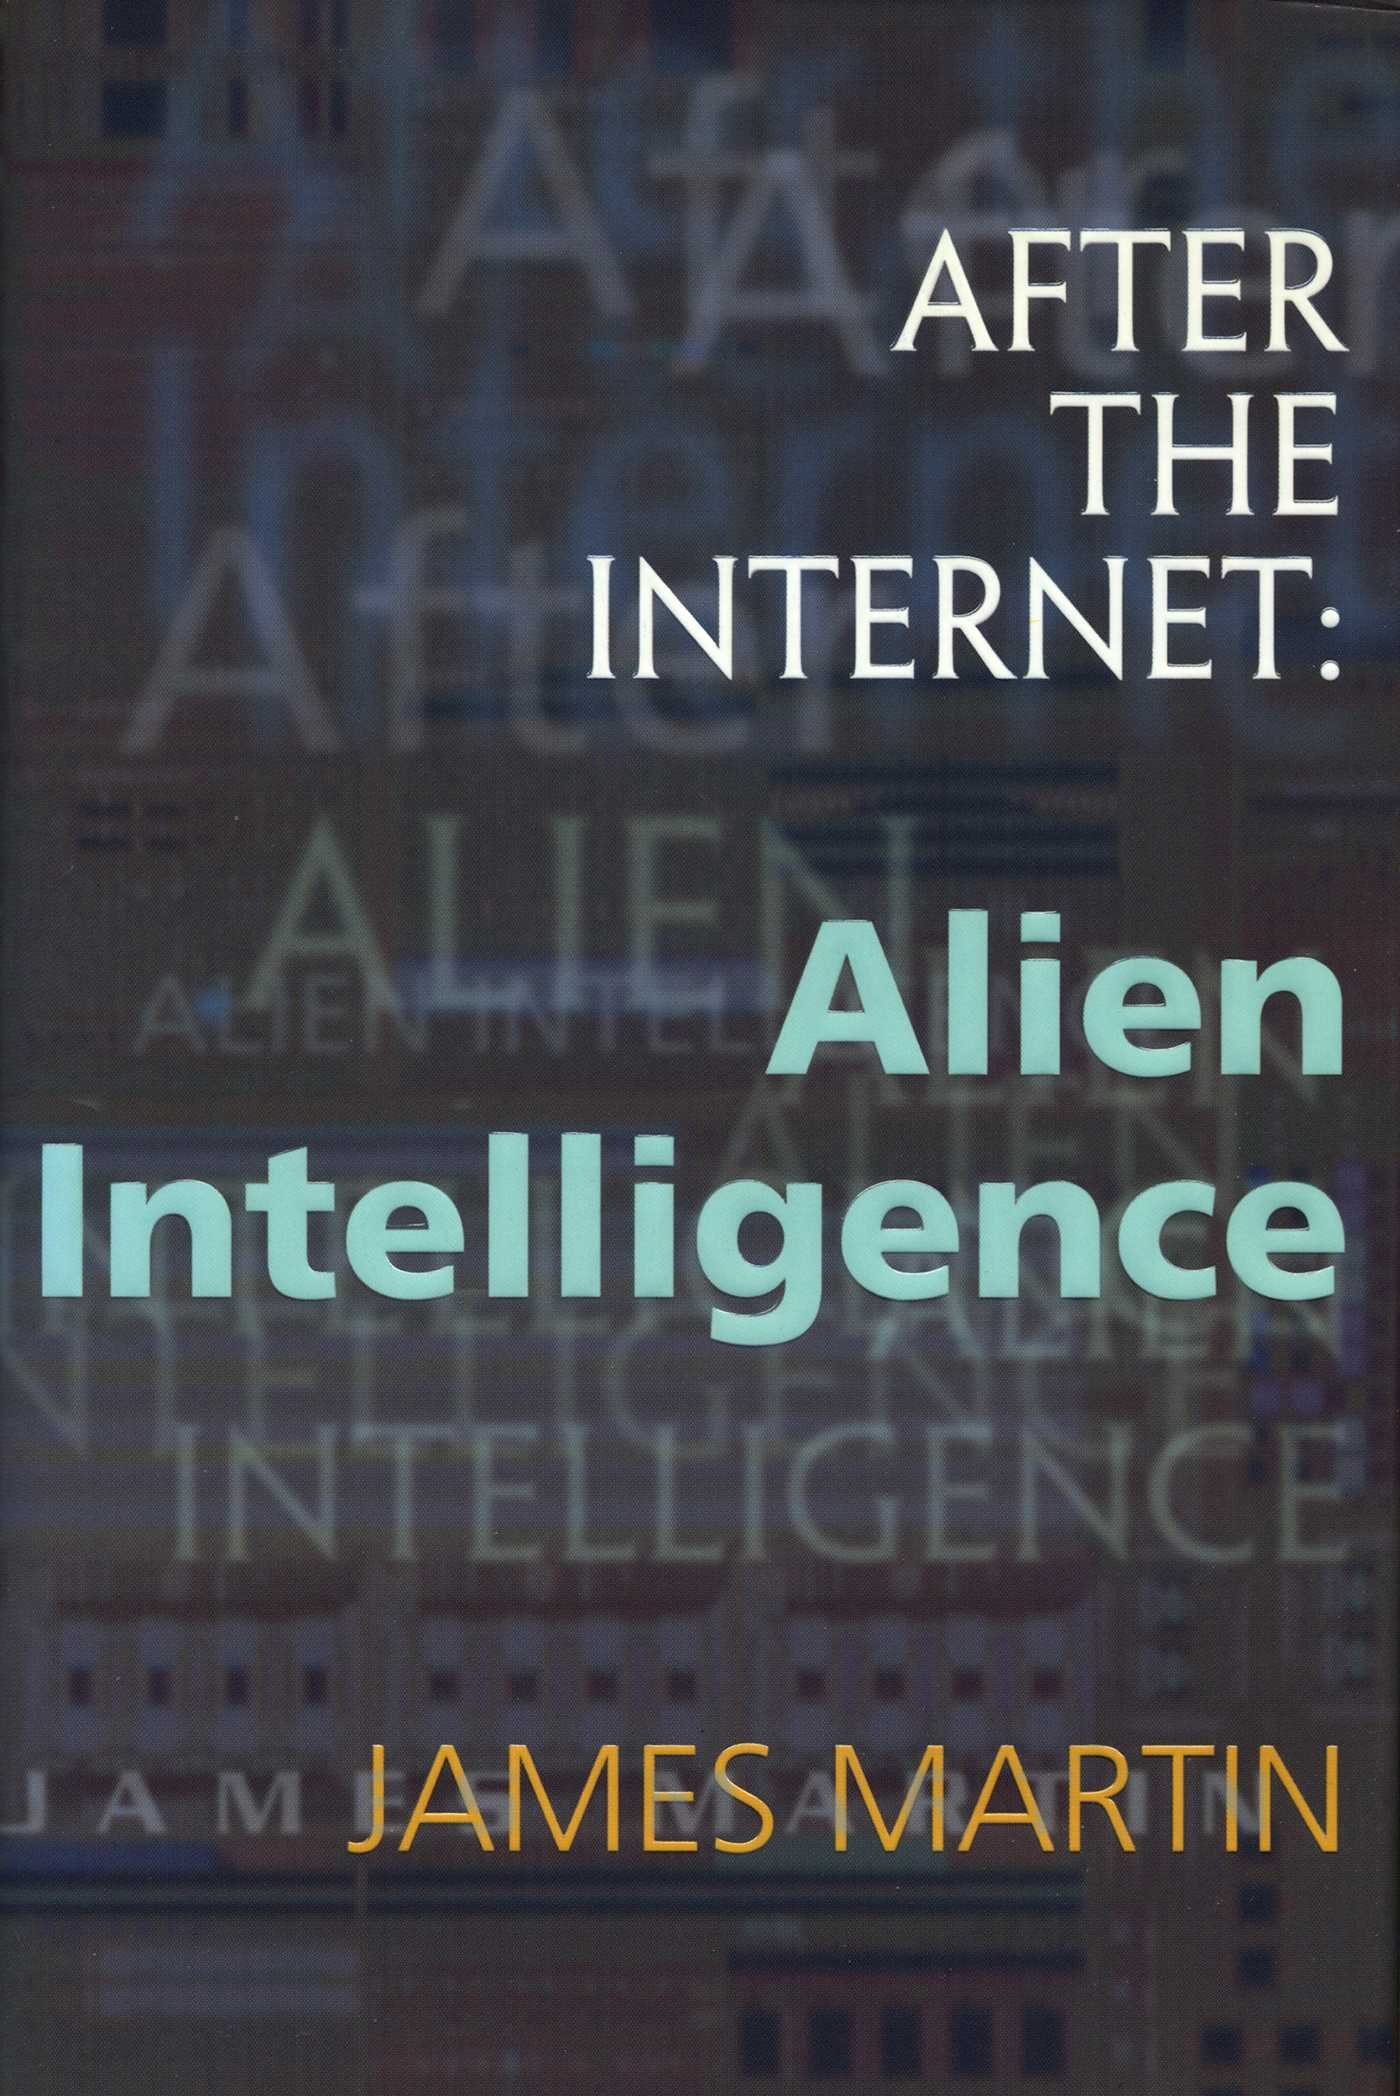 After the Internet: Alien Intelligence ebook